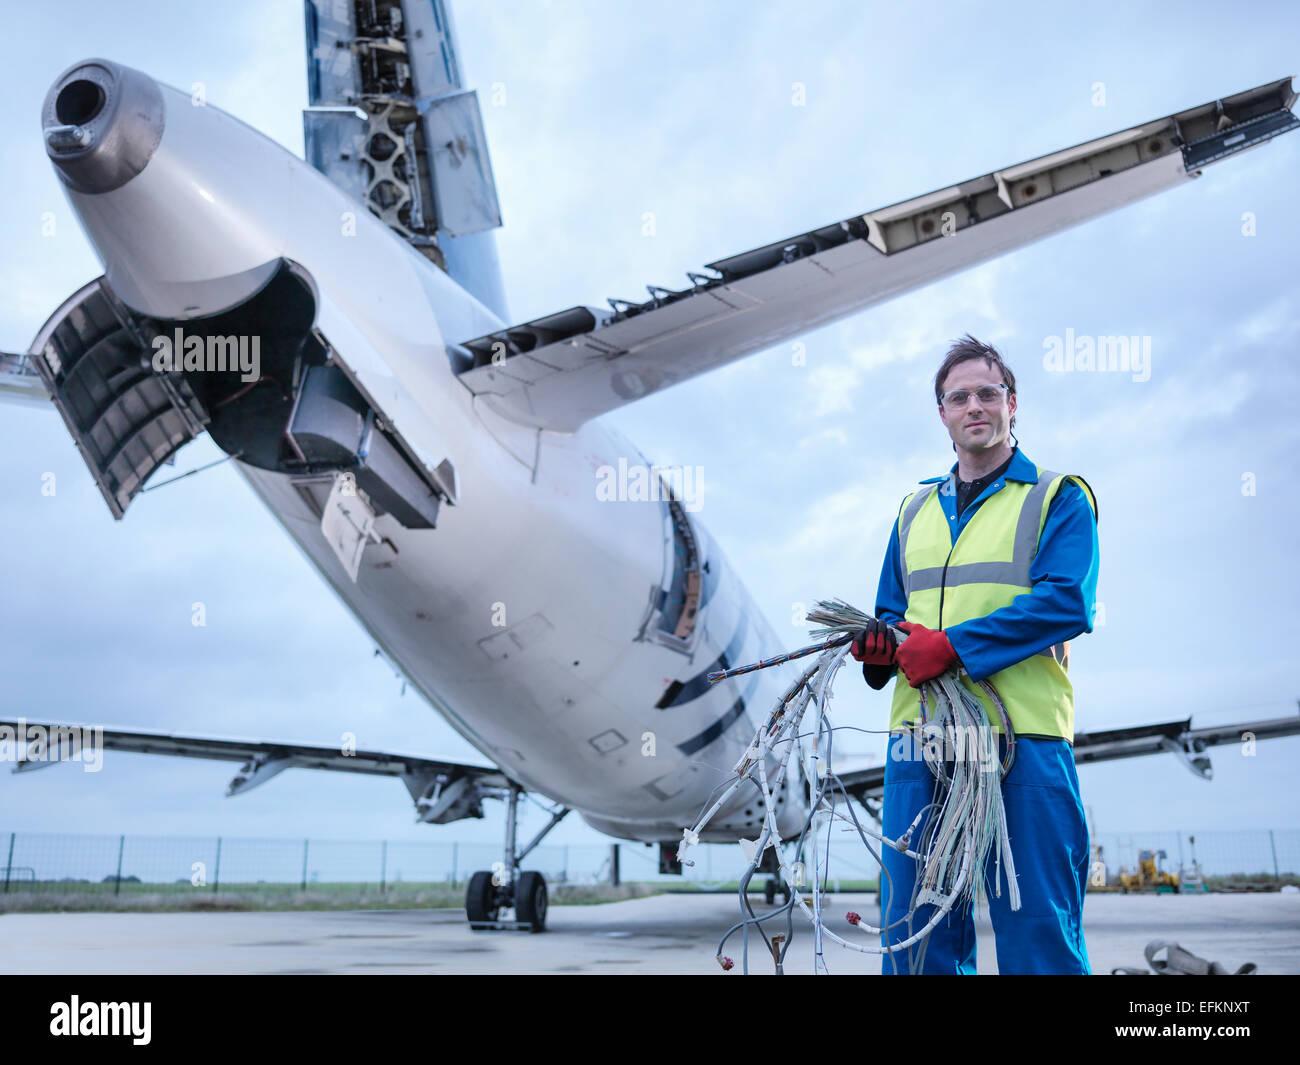 Ingenieur recycling Flugzeugteile auf der Piste, Porträt Stockbild